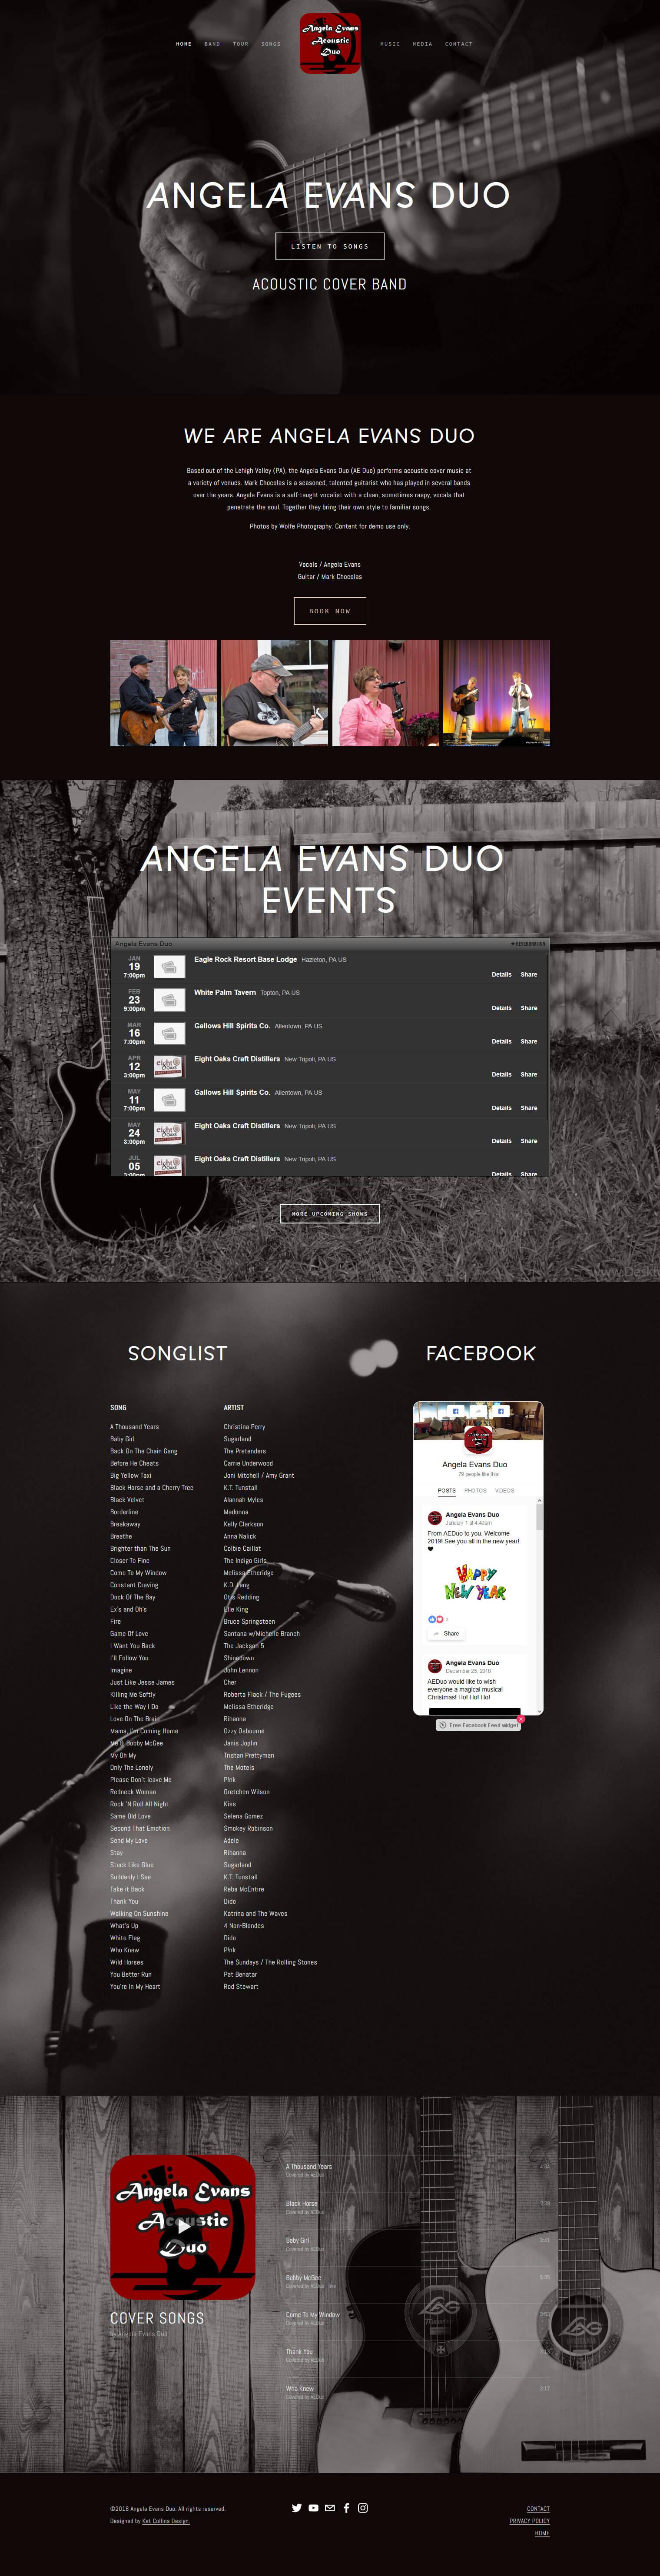 Angela Evans Duo band website design